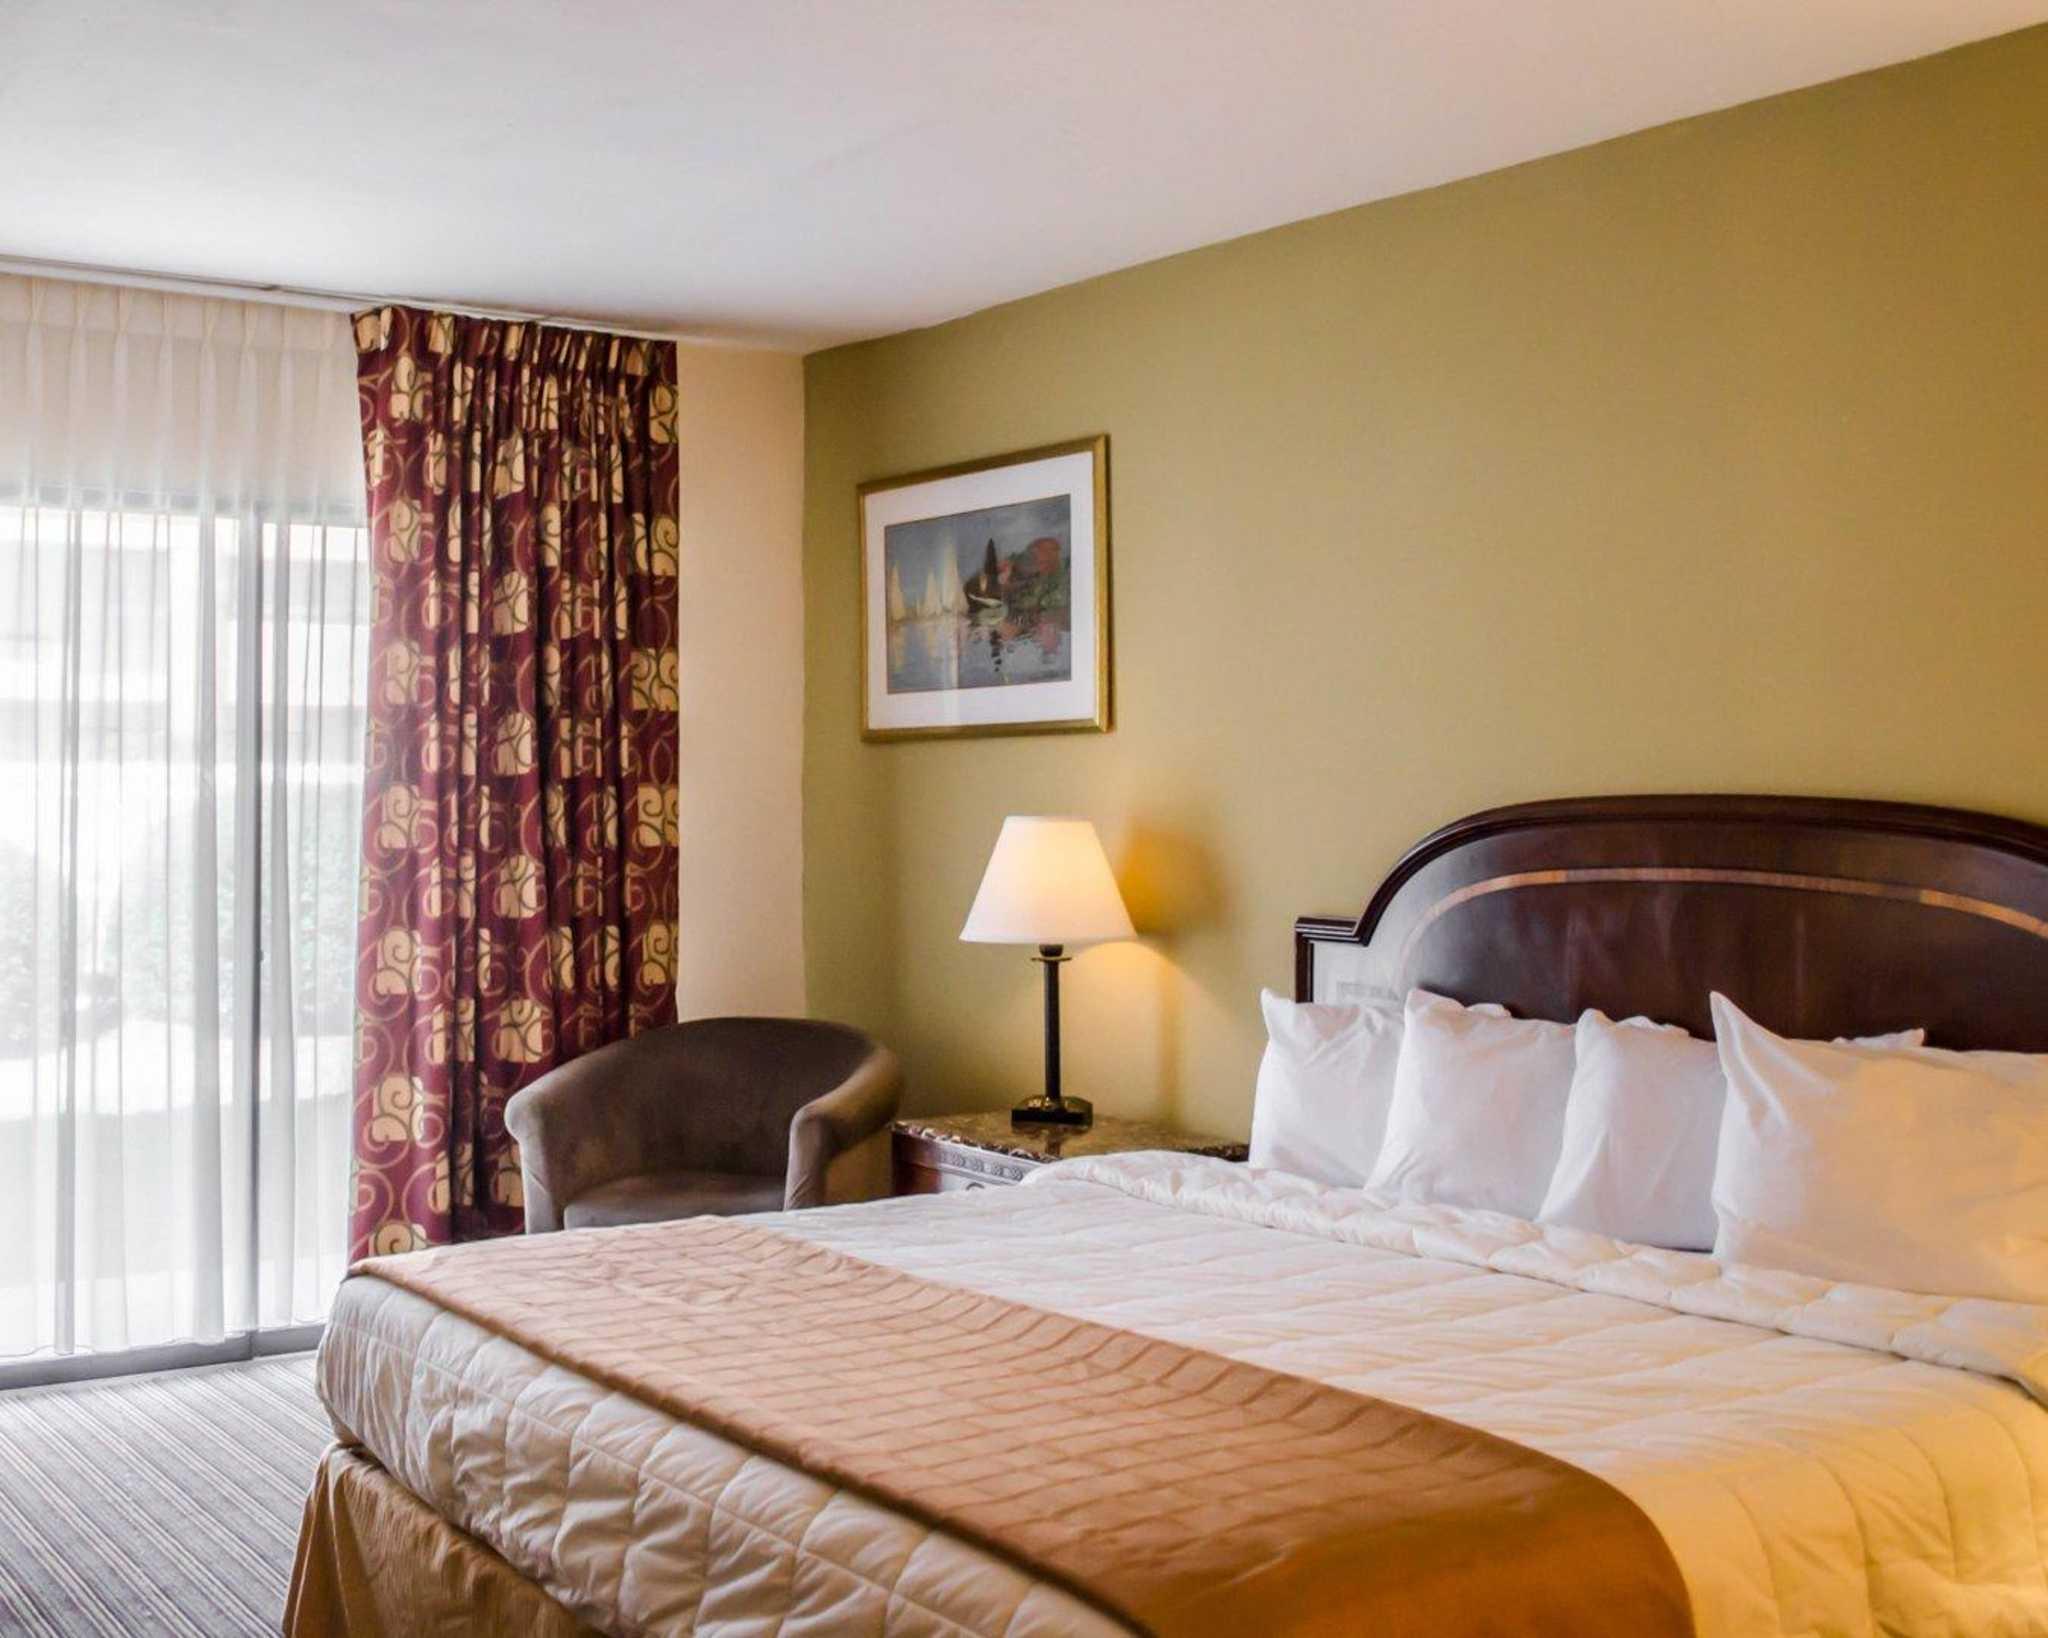 Quality Inn & Suites Pensacola Bayview in Pensacola, FL, photo #29